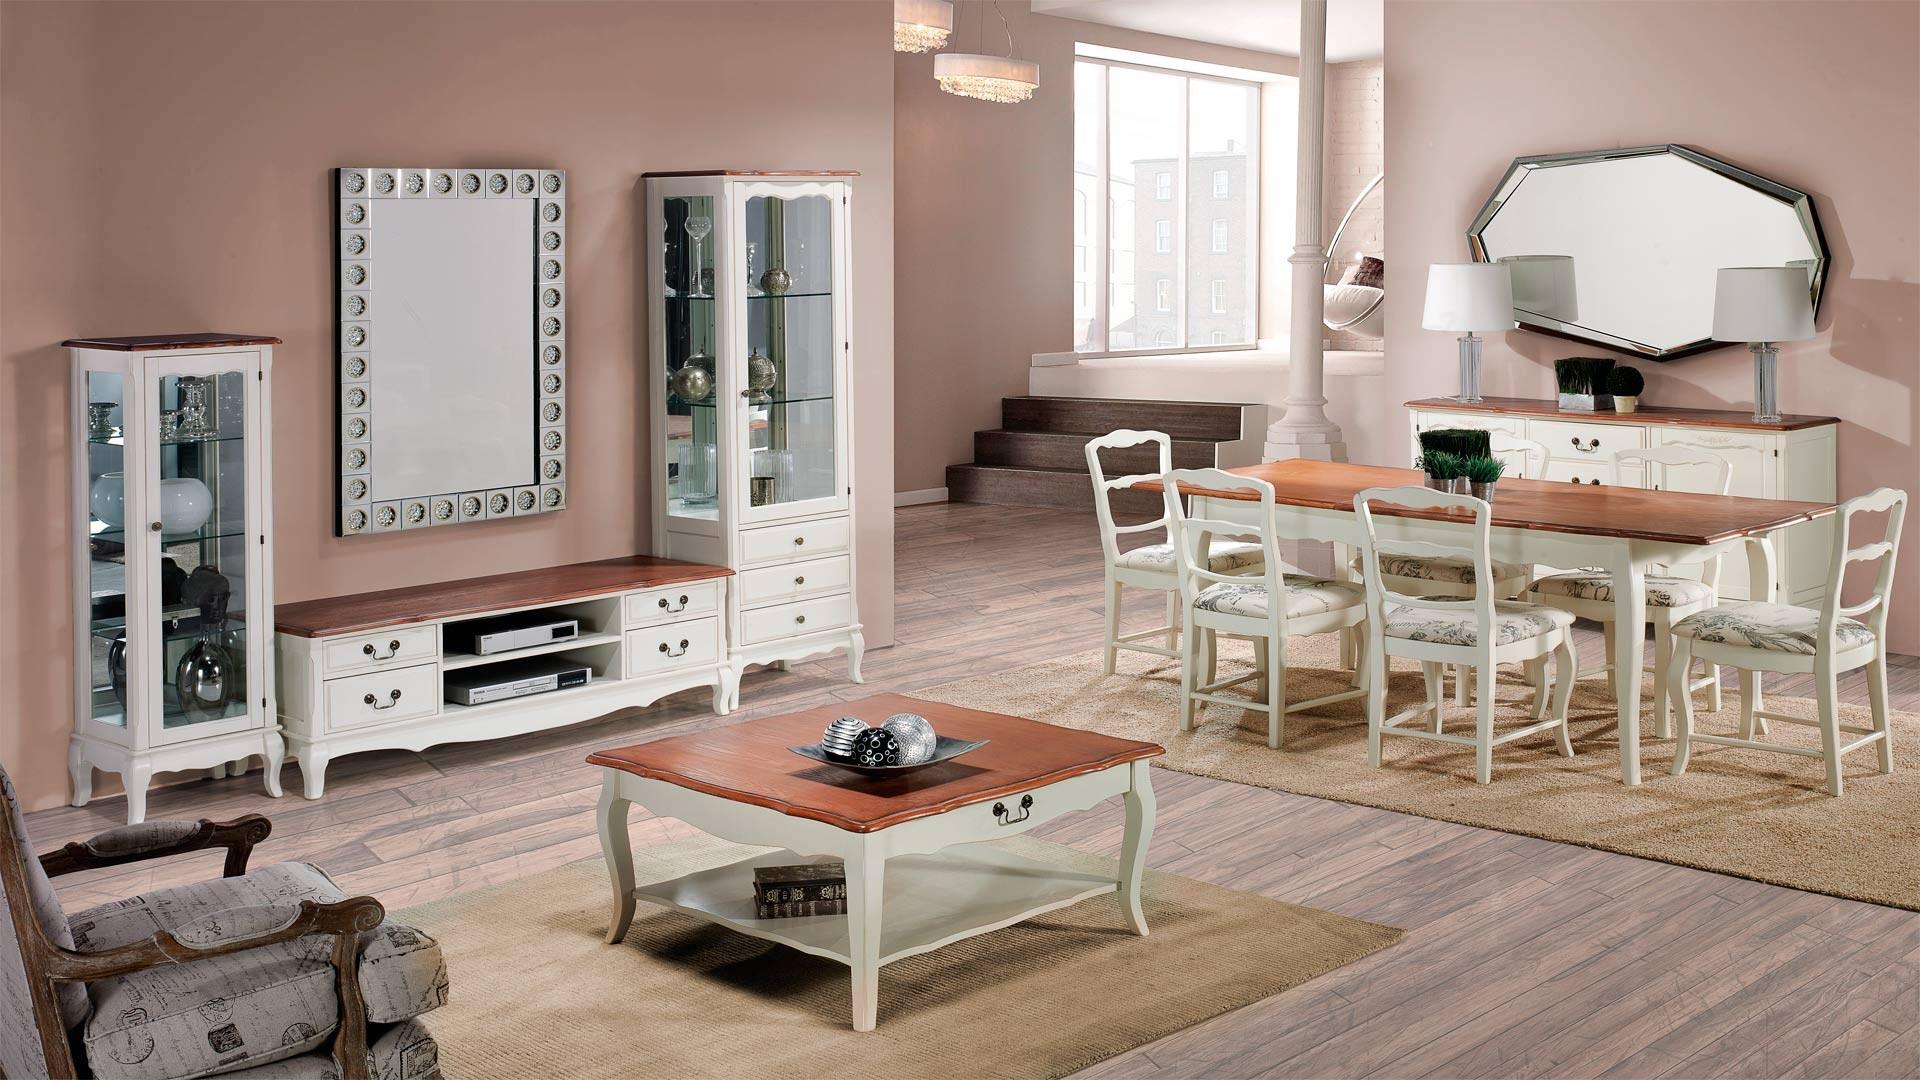 Salon comedor niza for Mobiliario salon comedor